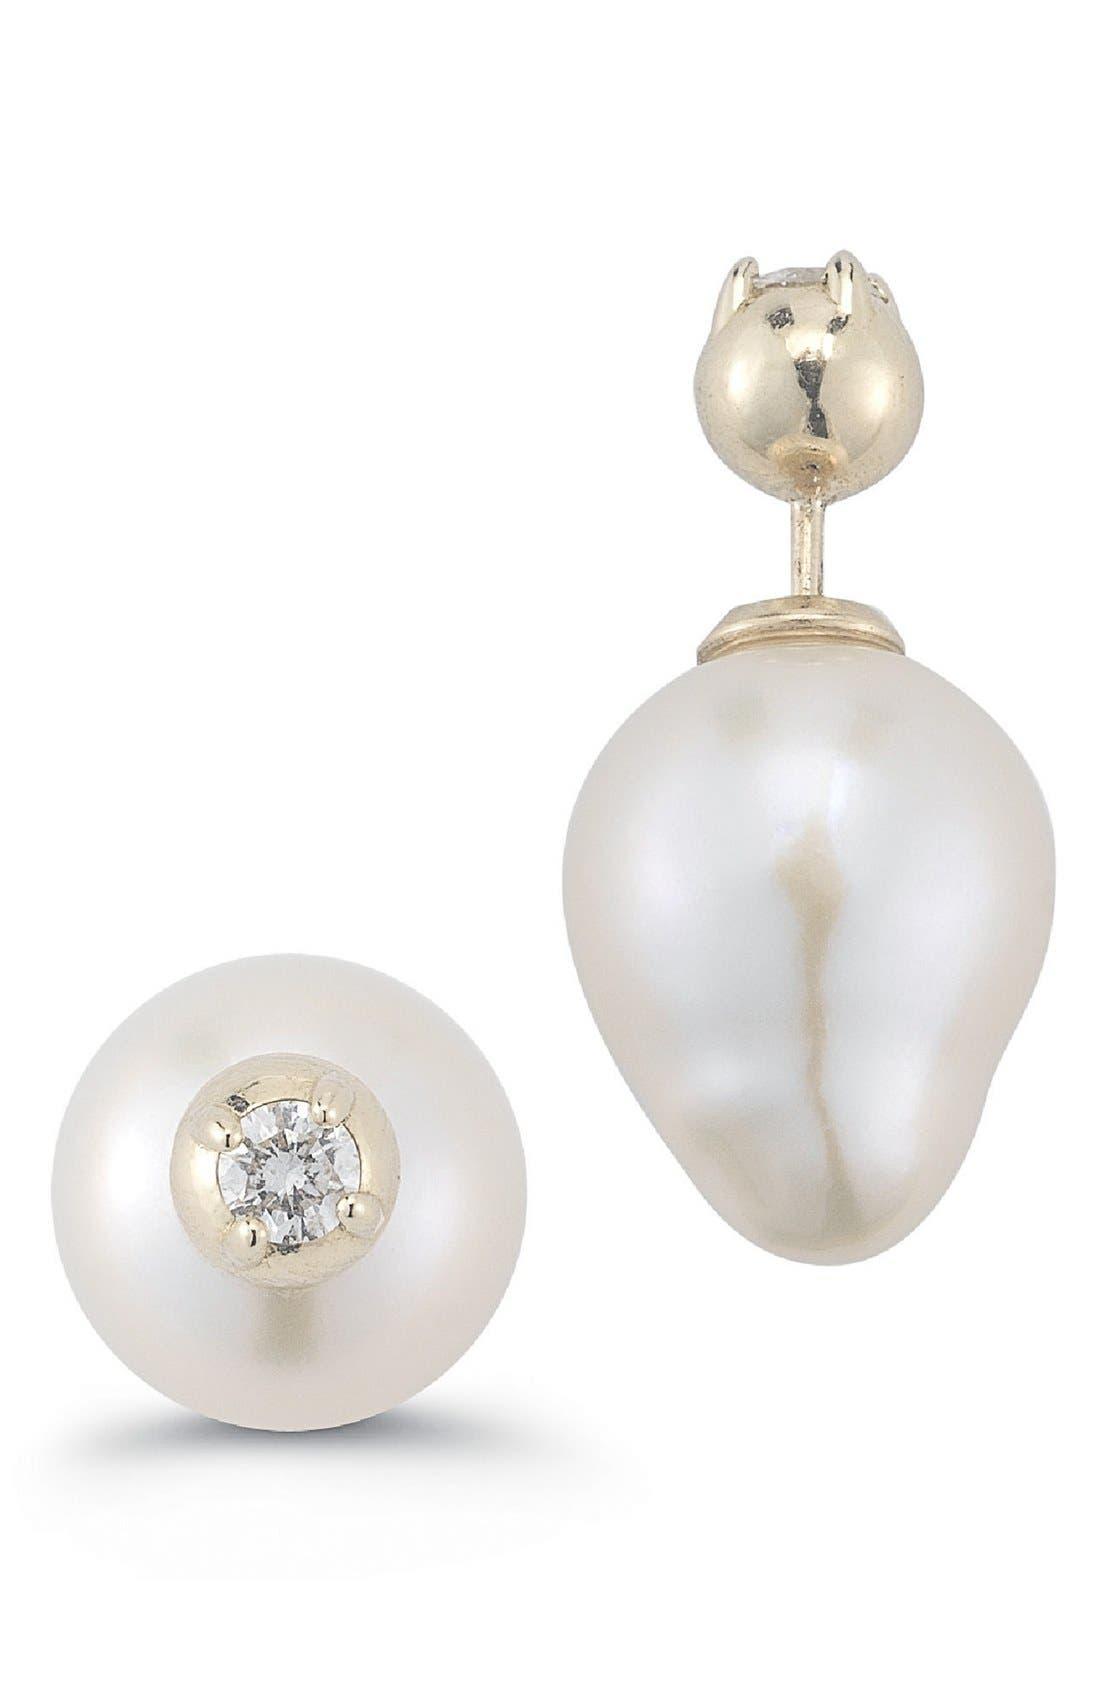 Double Stud Pearl & Diamond Earrings,                             Main thumbnail 1, color,                             YELLOW GOLD